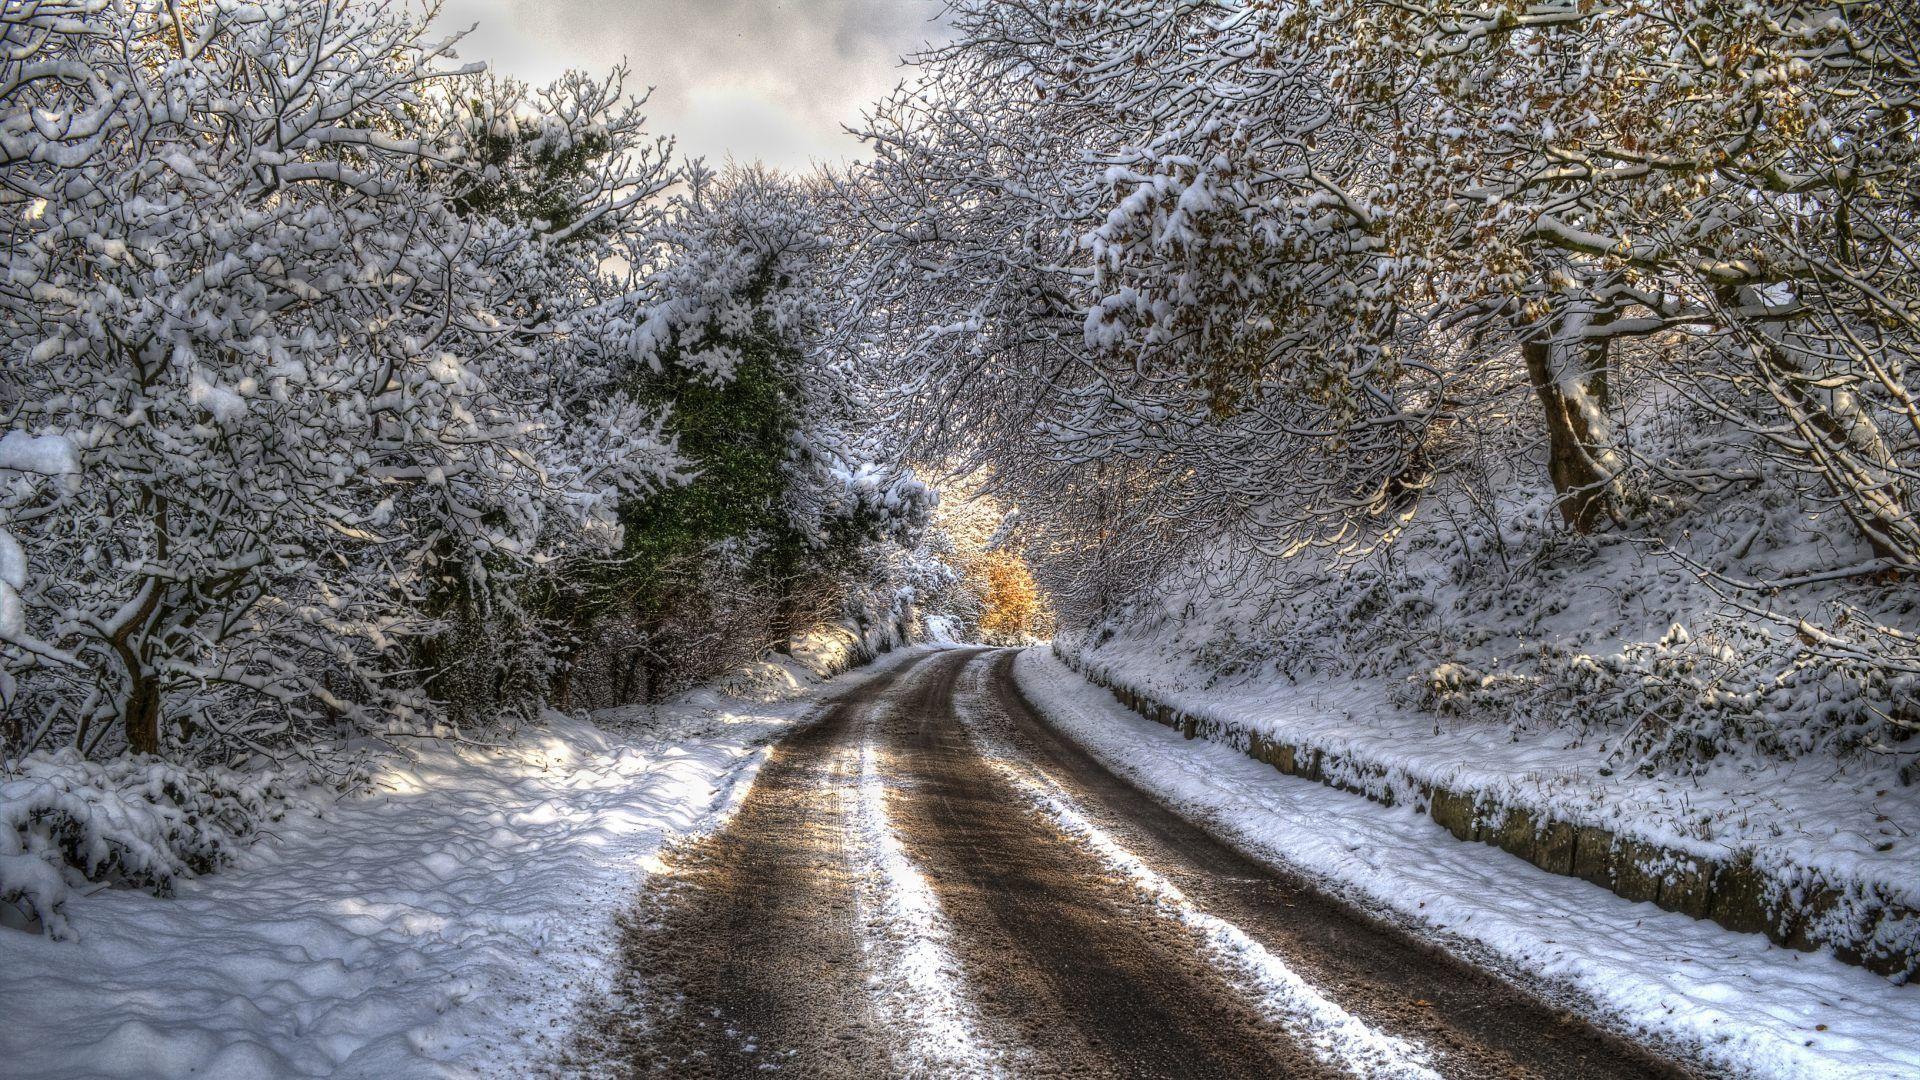 Fondo Escritorio Paisaje Nevada En Cumbre: Carretera Cubierta De Nieve